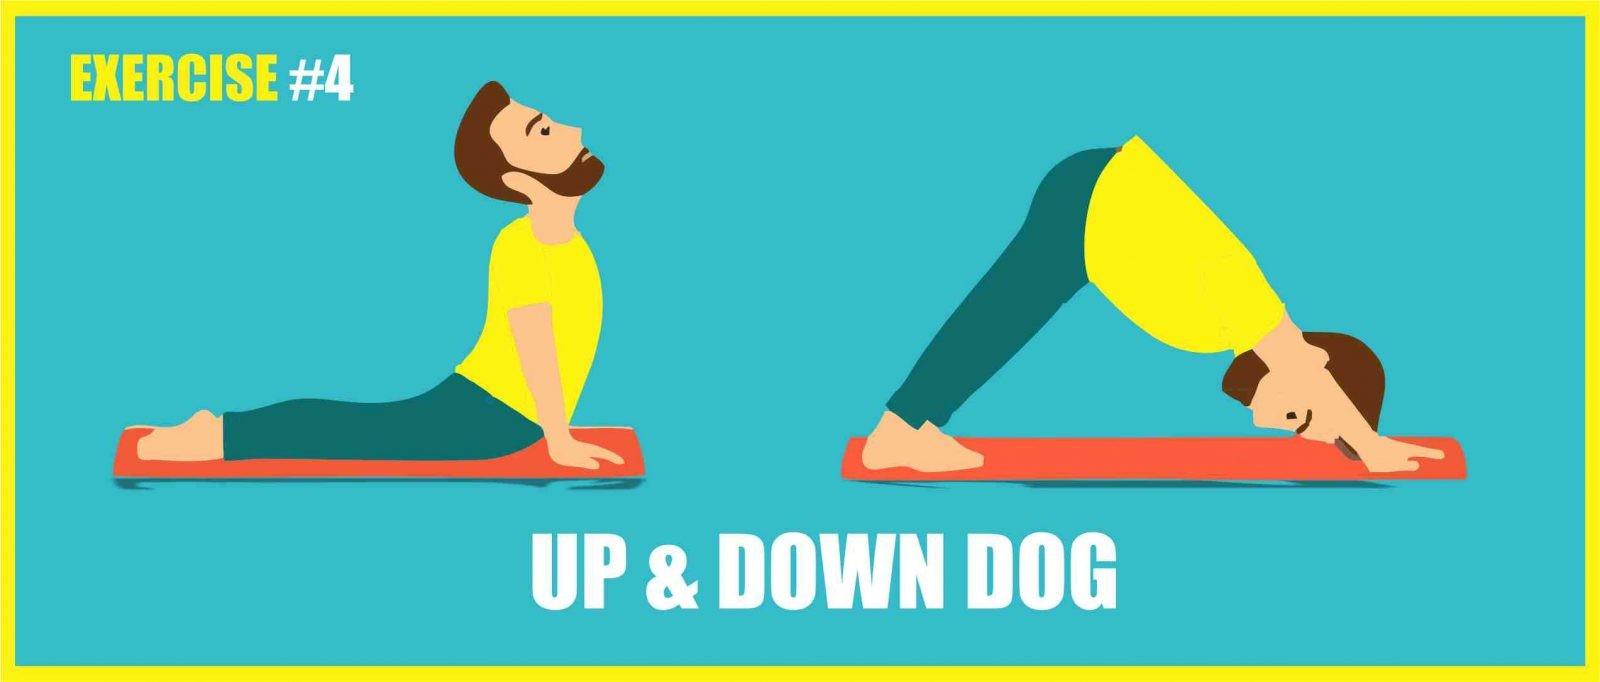 up gog down dog exercise